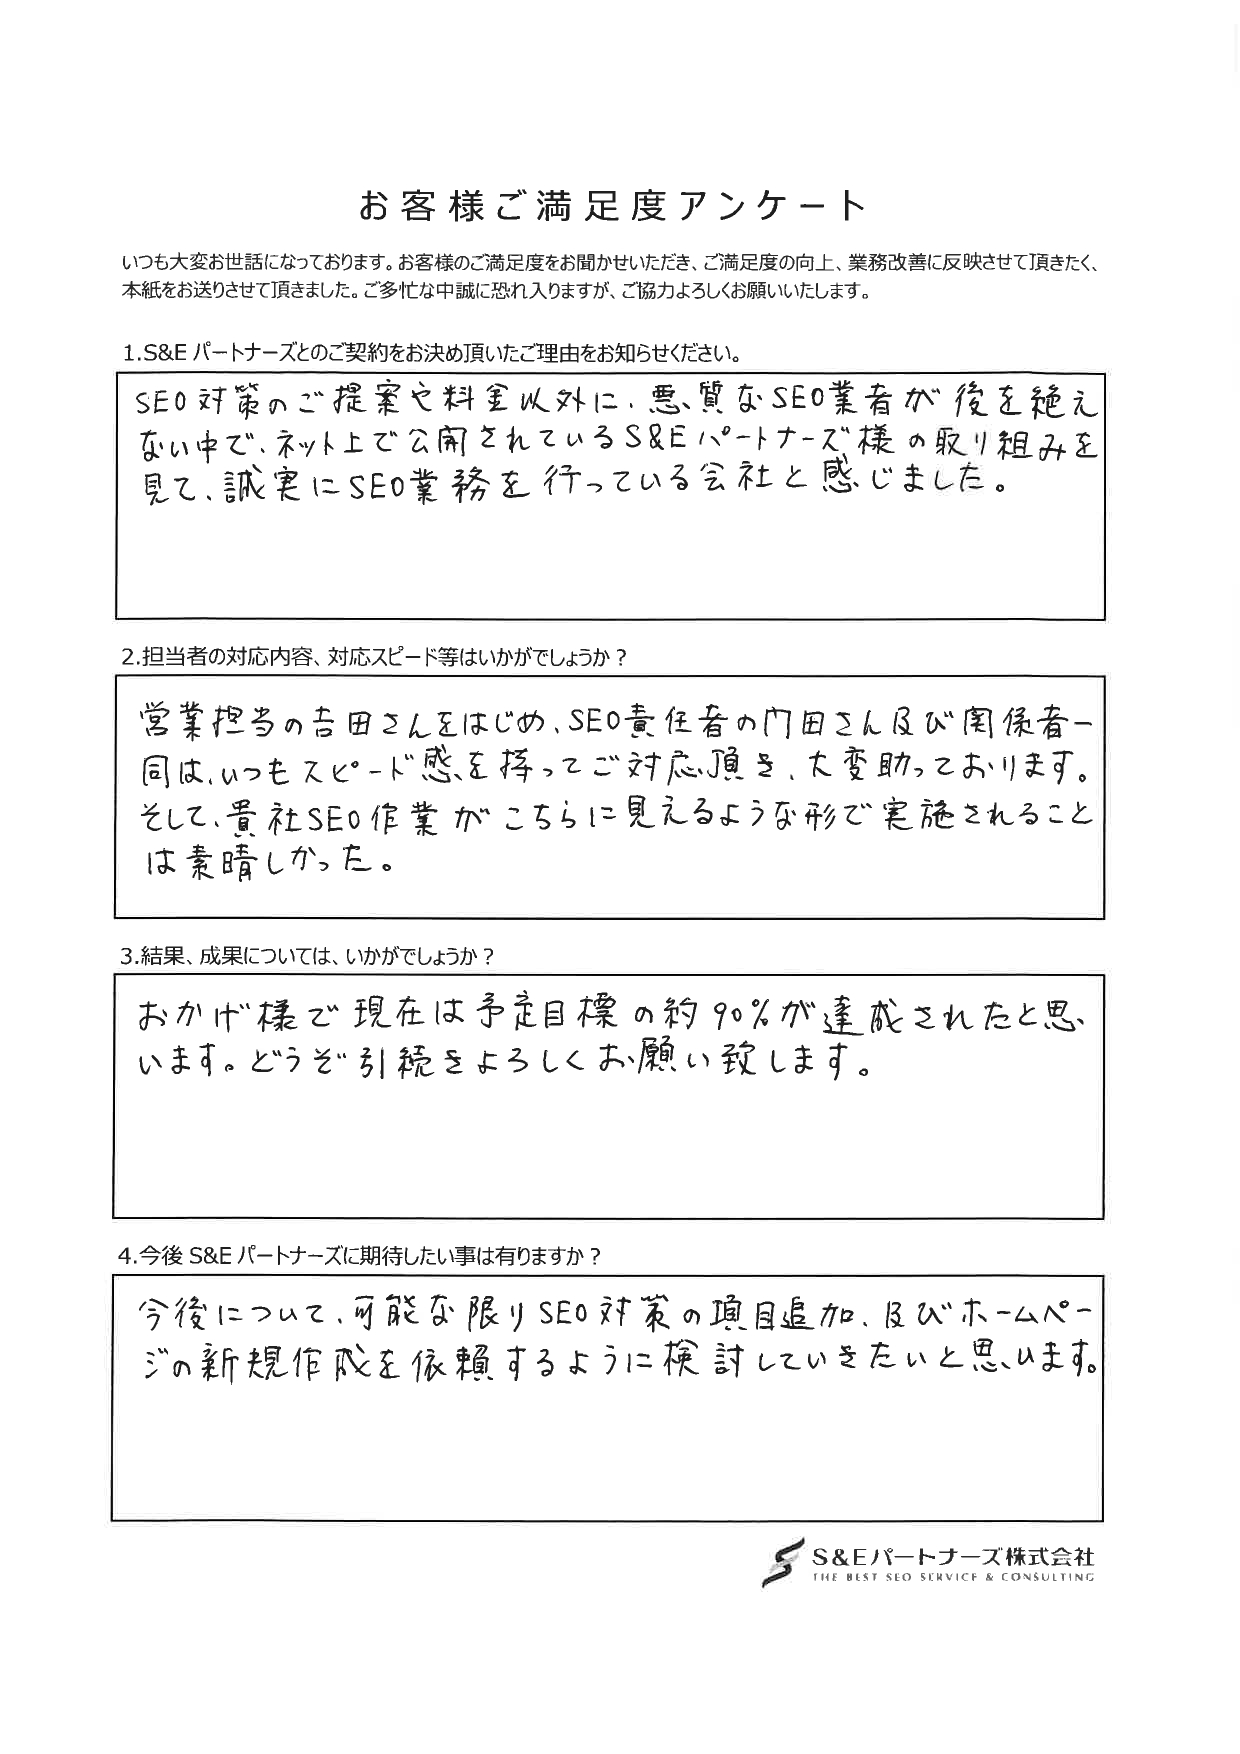 【SEO対策】翻訳サービスを提供されているお客様